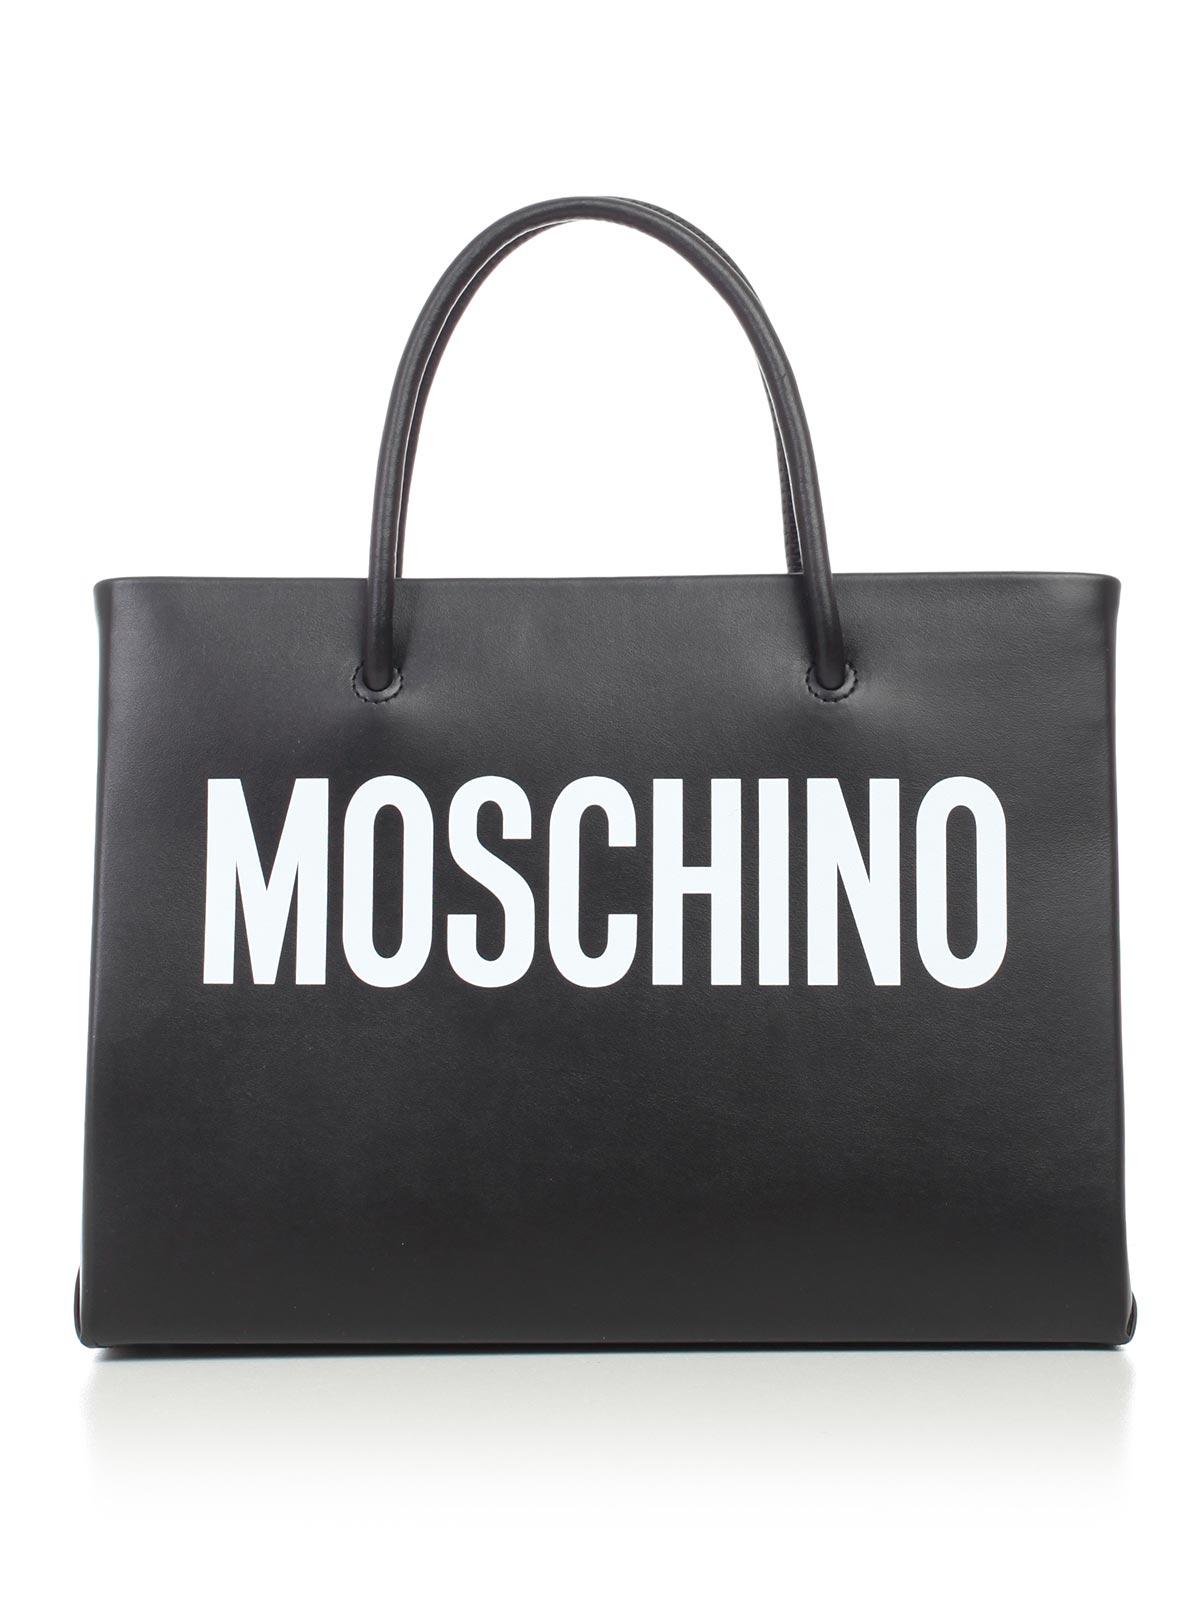 half price recognized brands available Moschino Bags A7415.8001 - 1555 FANTASY PRINT BLACK.Bernardelli ...